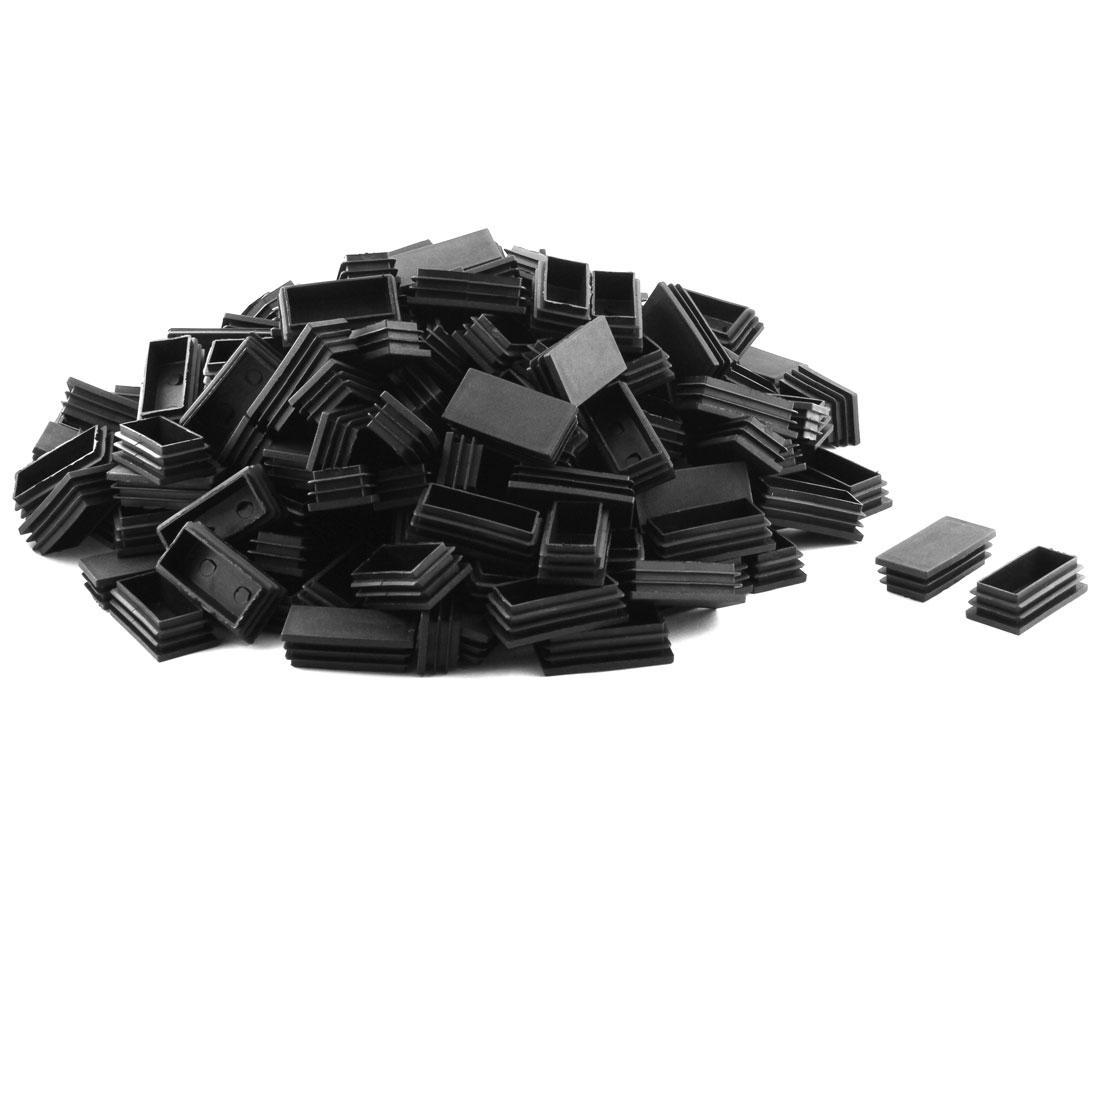 Plastic Rectangle Design Tube Insert End Blanking Cover Cap Black 30 x 59mm 200pcs